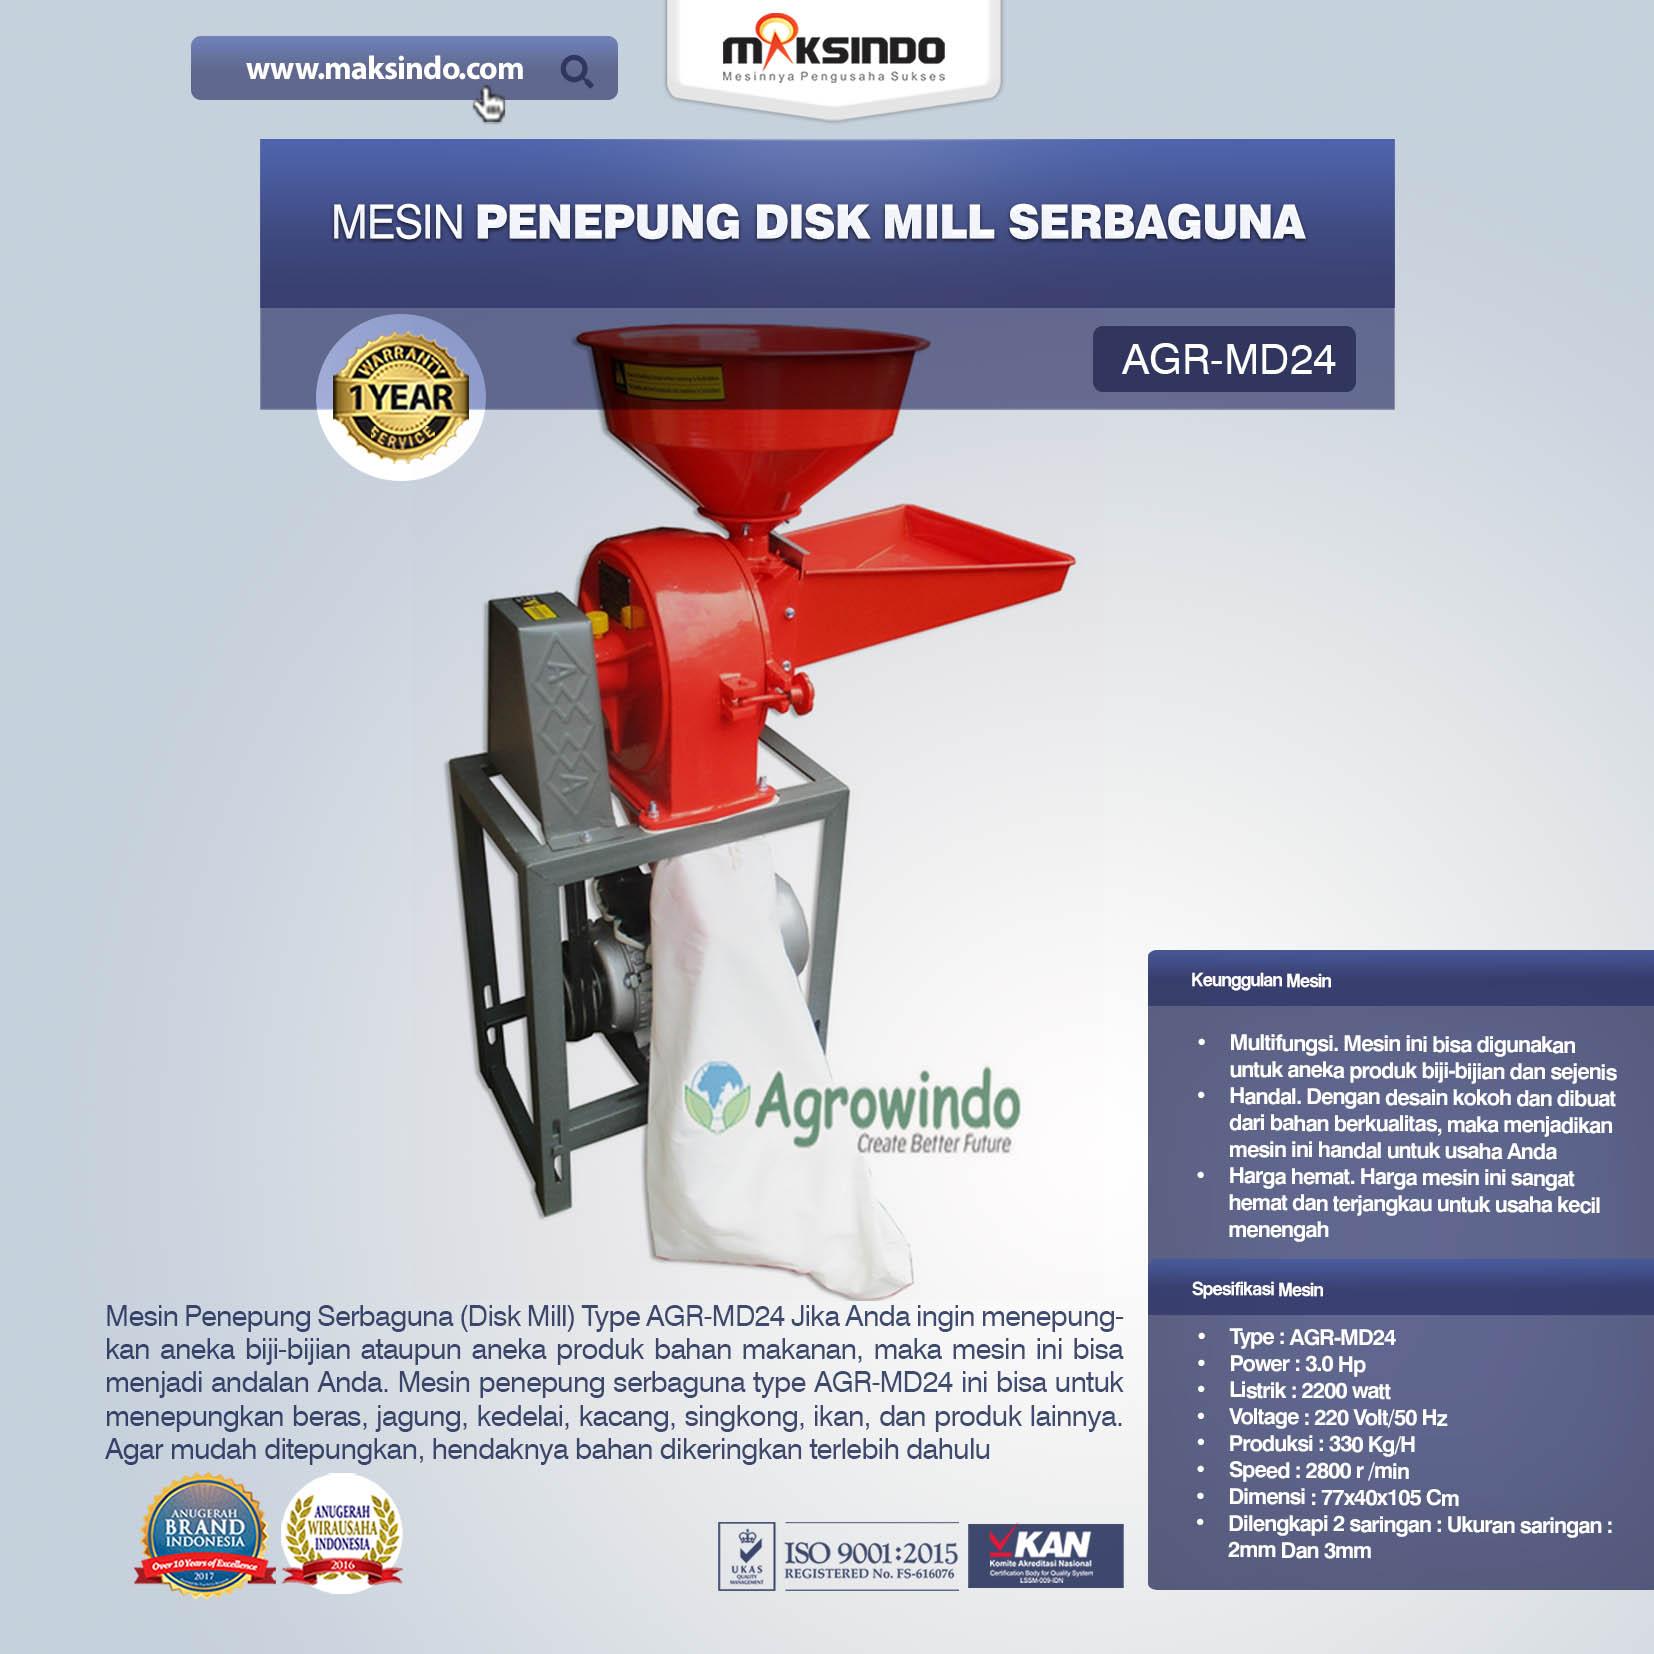 Penepung Disk Mill Serbaguna (AGR-MD24)